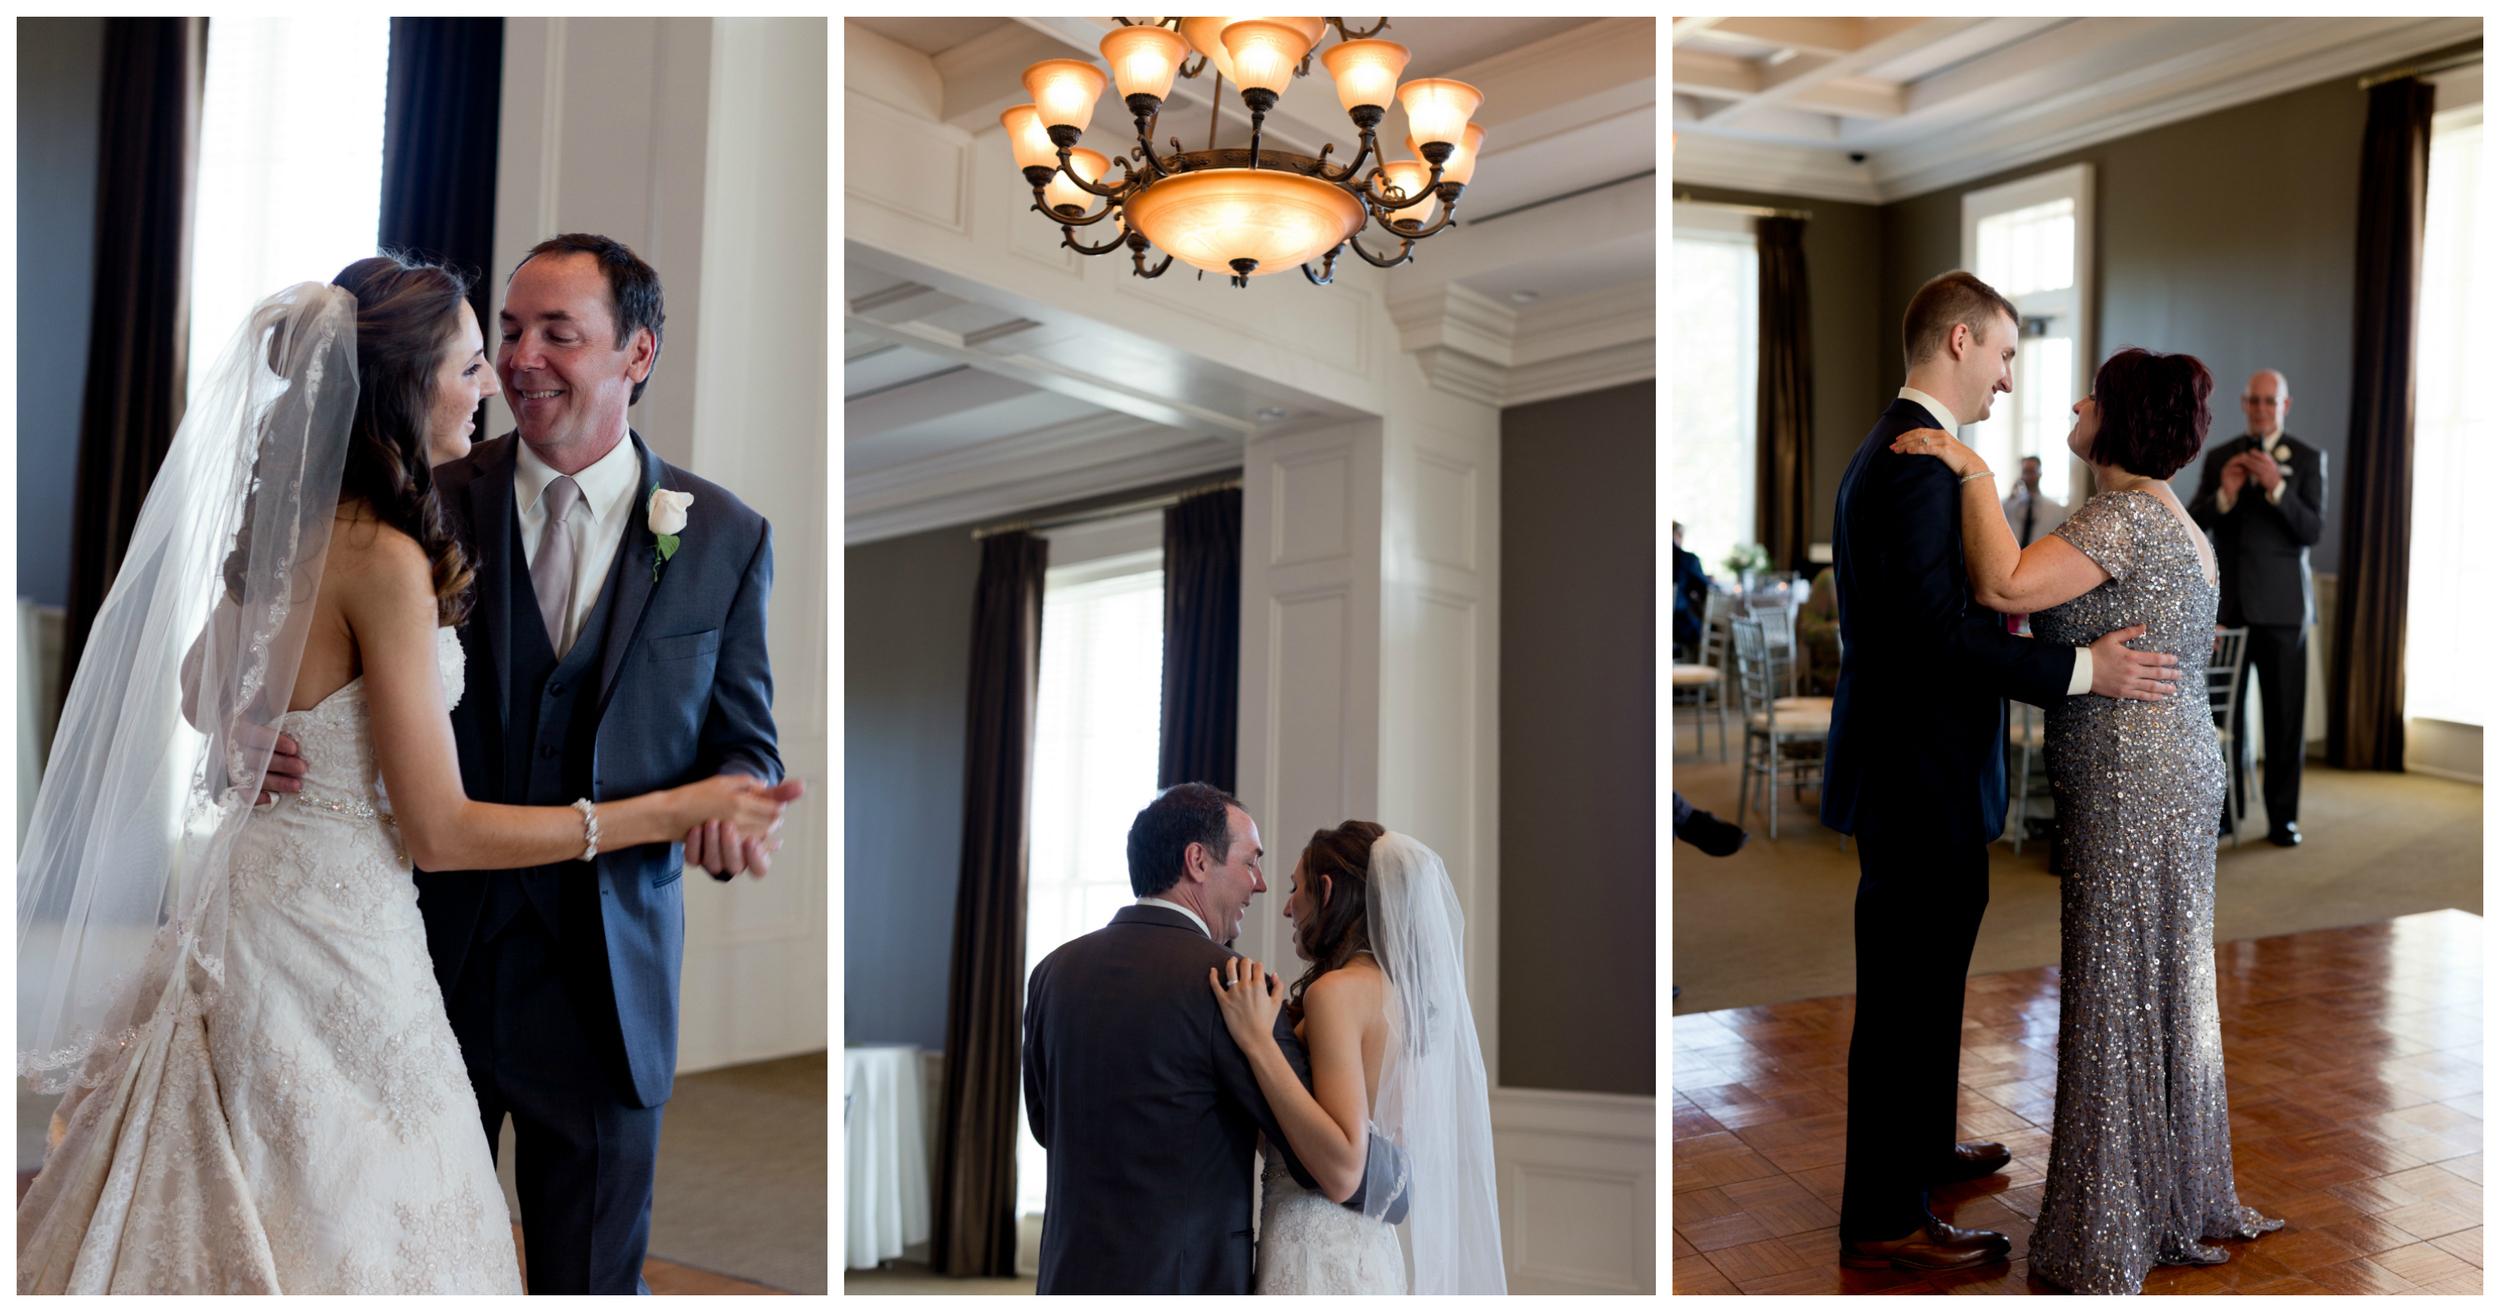 parent dances at wedding (Biloxi Visitors Center)